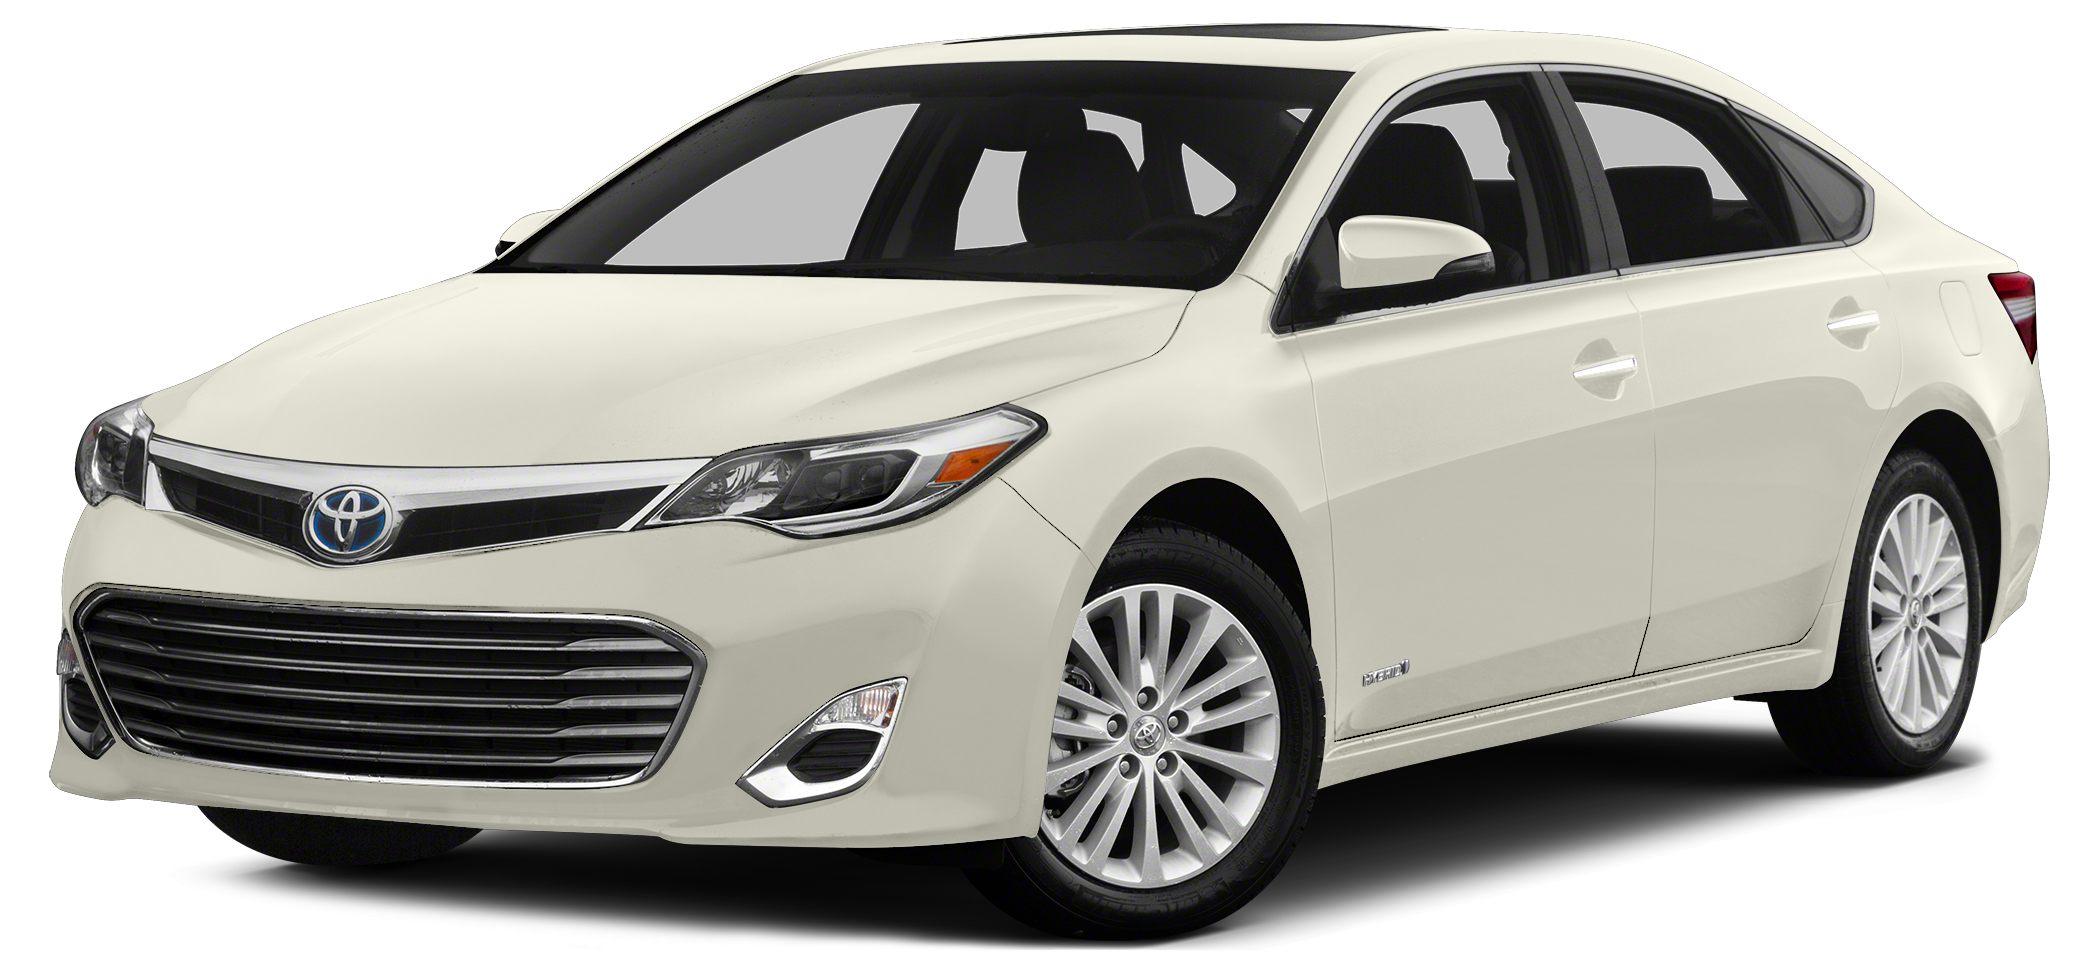 2014 Toyota Avalon Hybrid Limited Miles 8604Color White Stock T25150 VIN 4T1BD1EB5EU031236